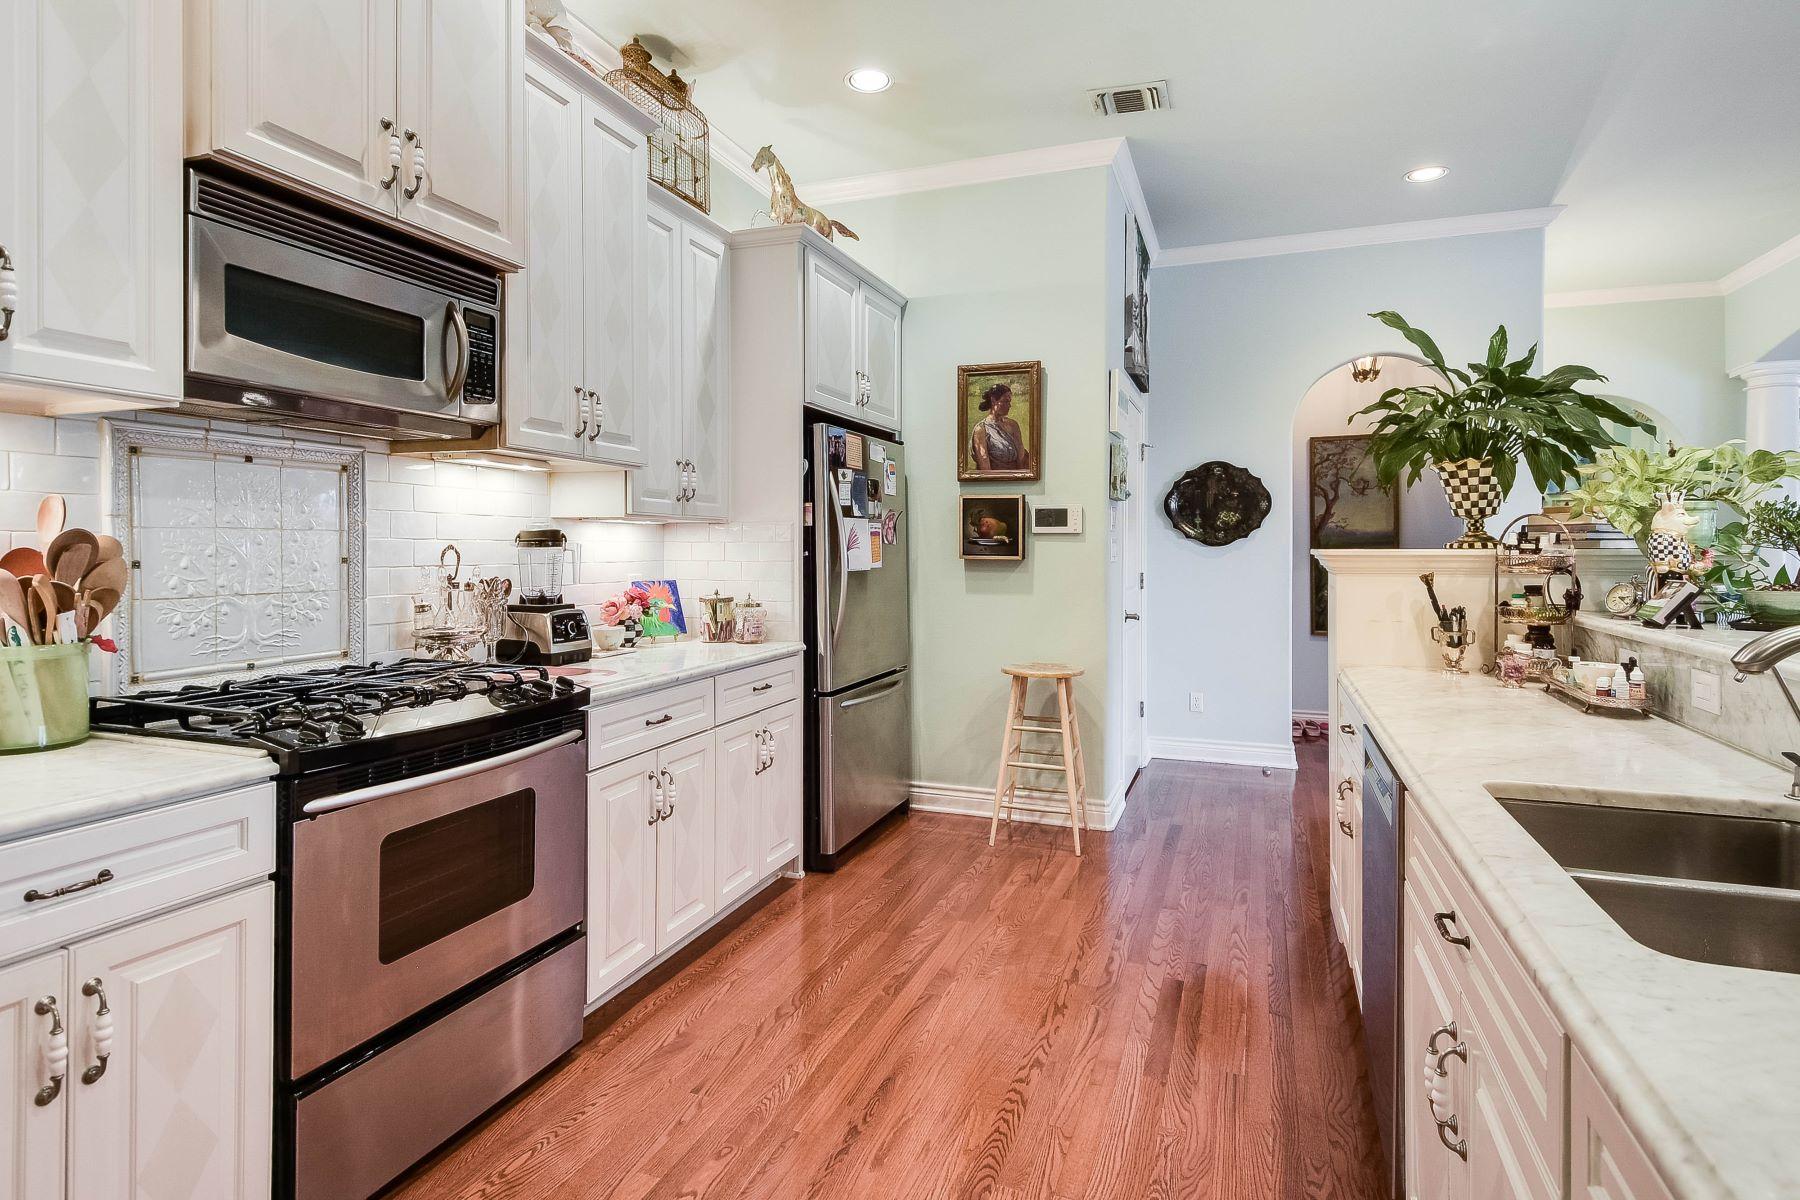 Additional photo for property listing at Condominium in Alamo Heights 320 Kampmann Avenue #2B San Antonio, Texas 78209 United States